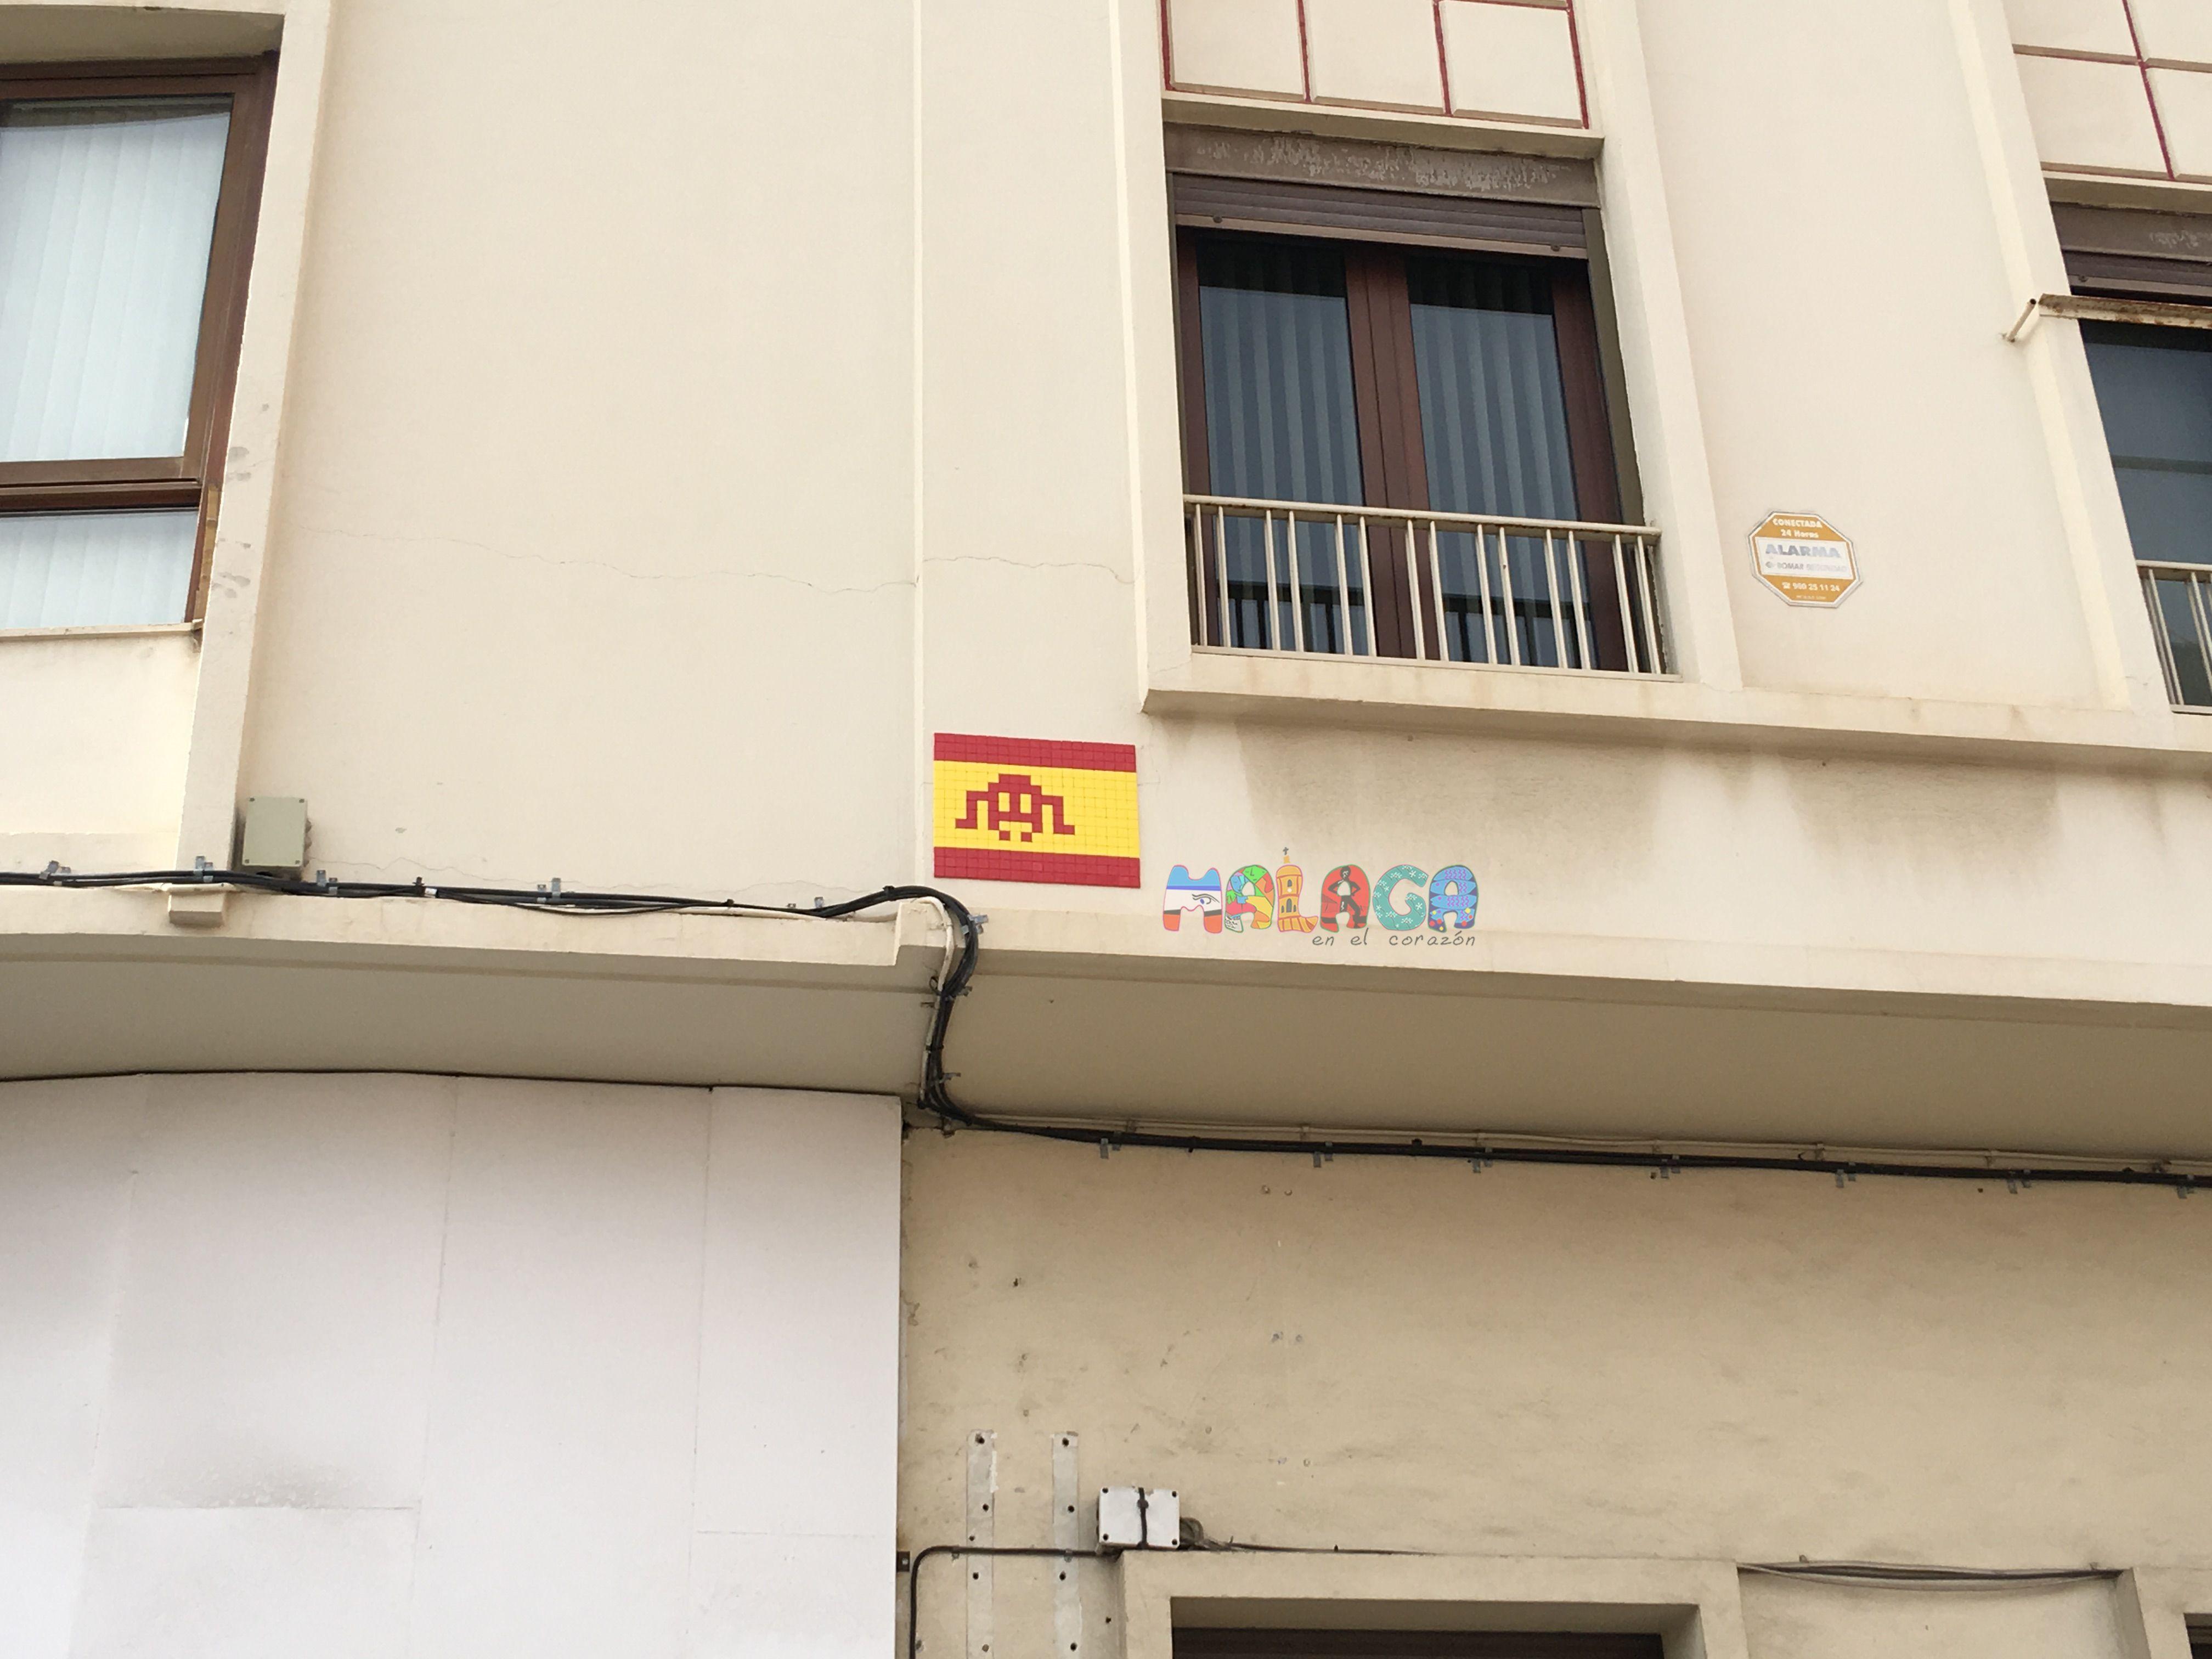 Invader-Malaga23